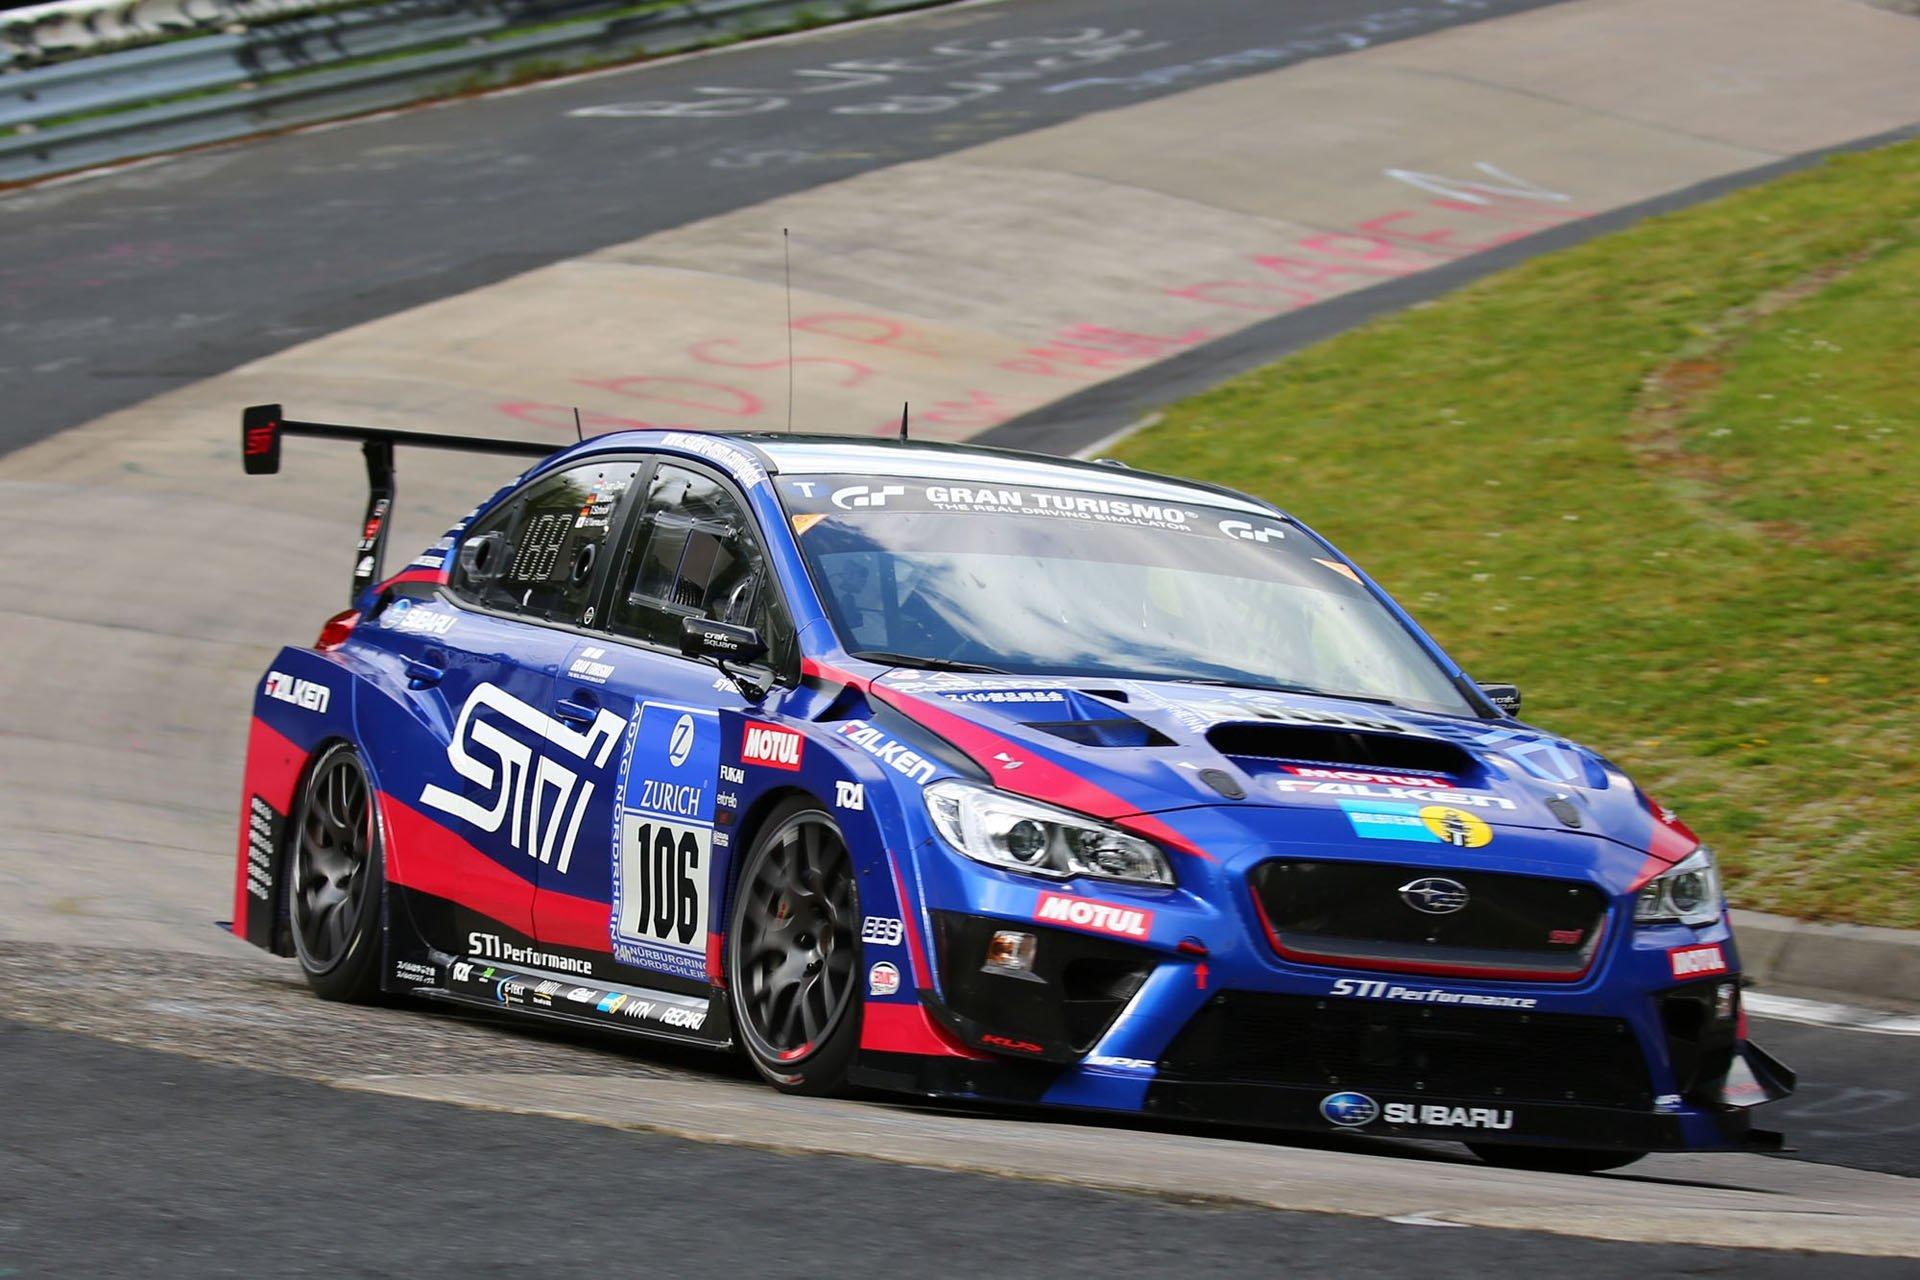 Subaru WRX STI NBR